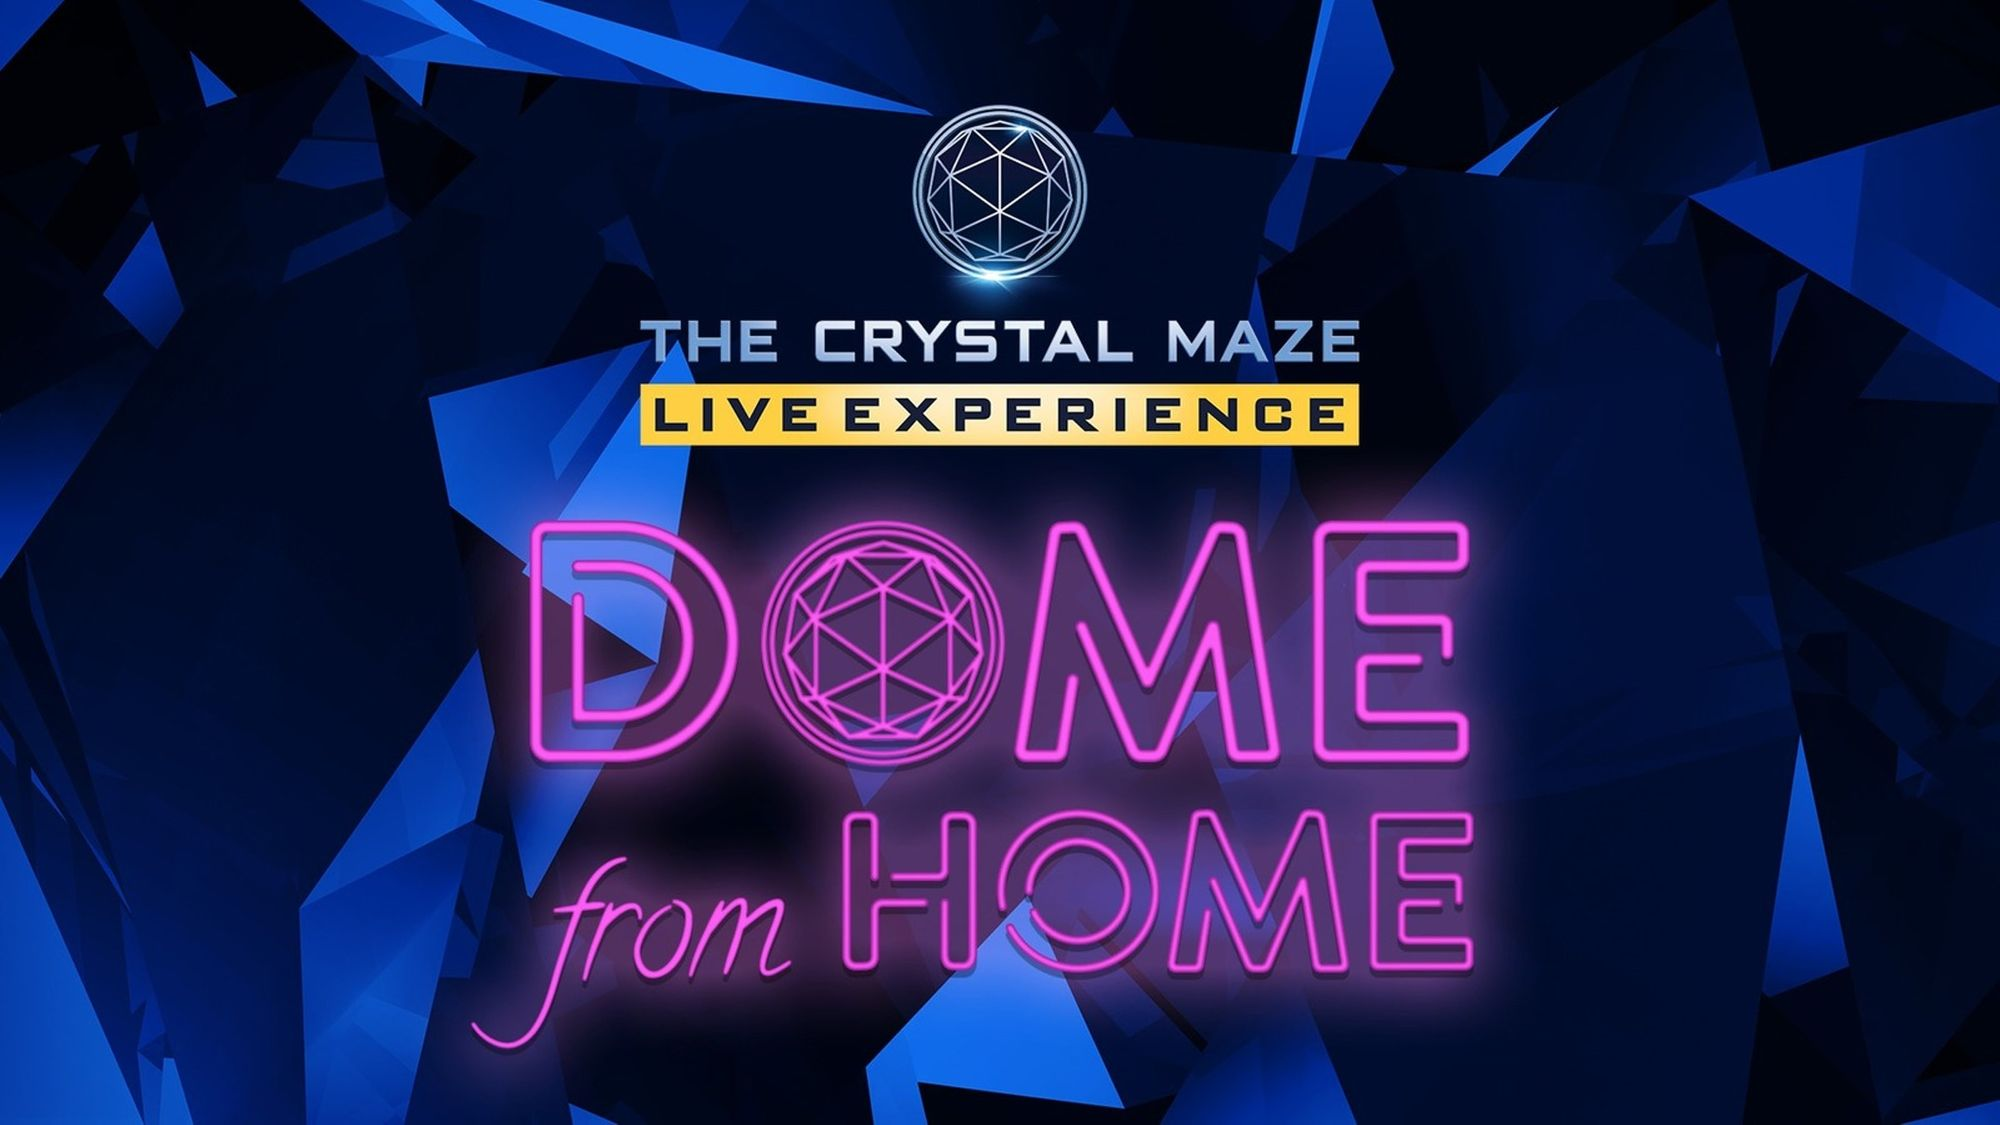 virtual crystal maze experience